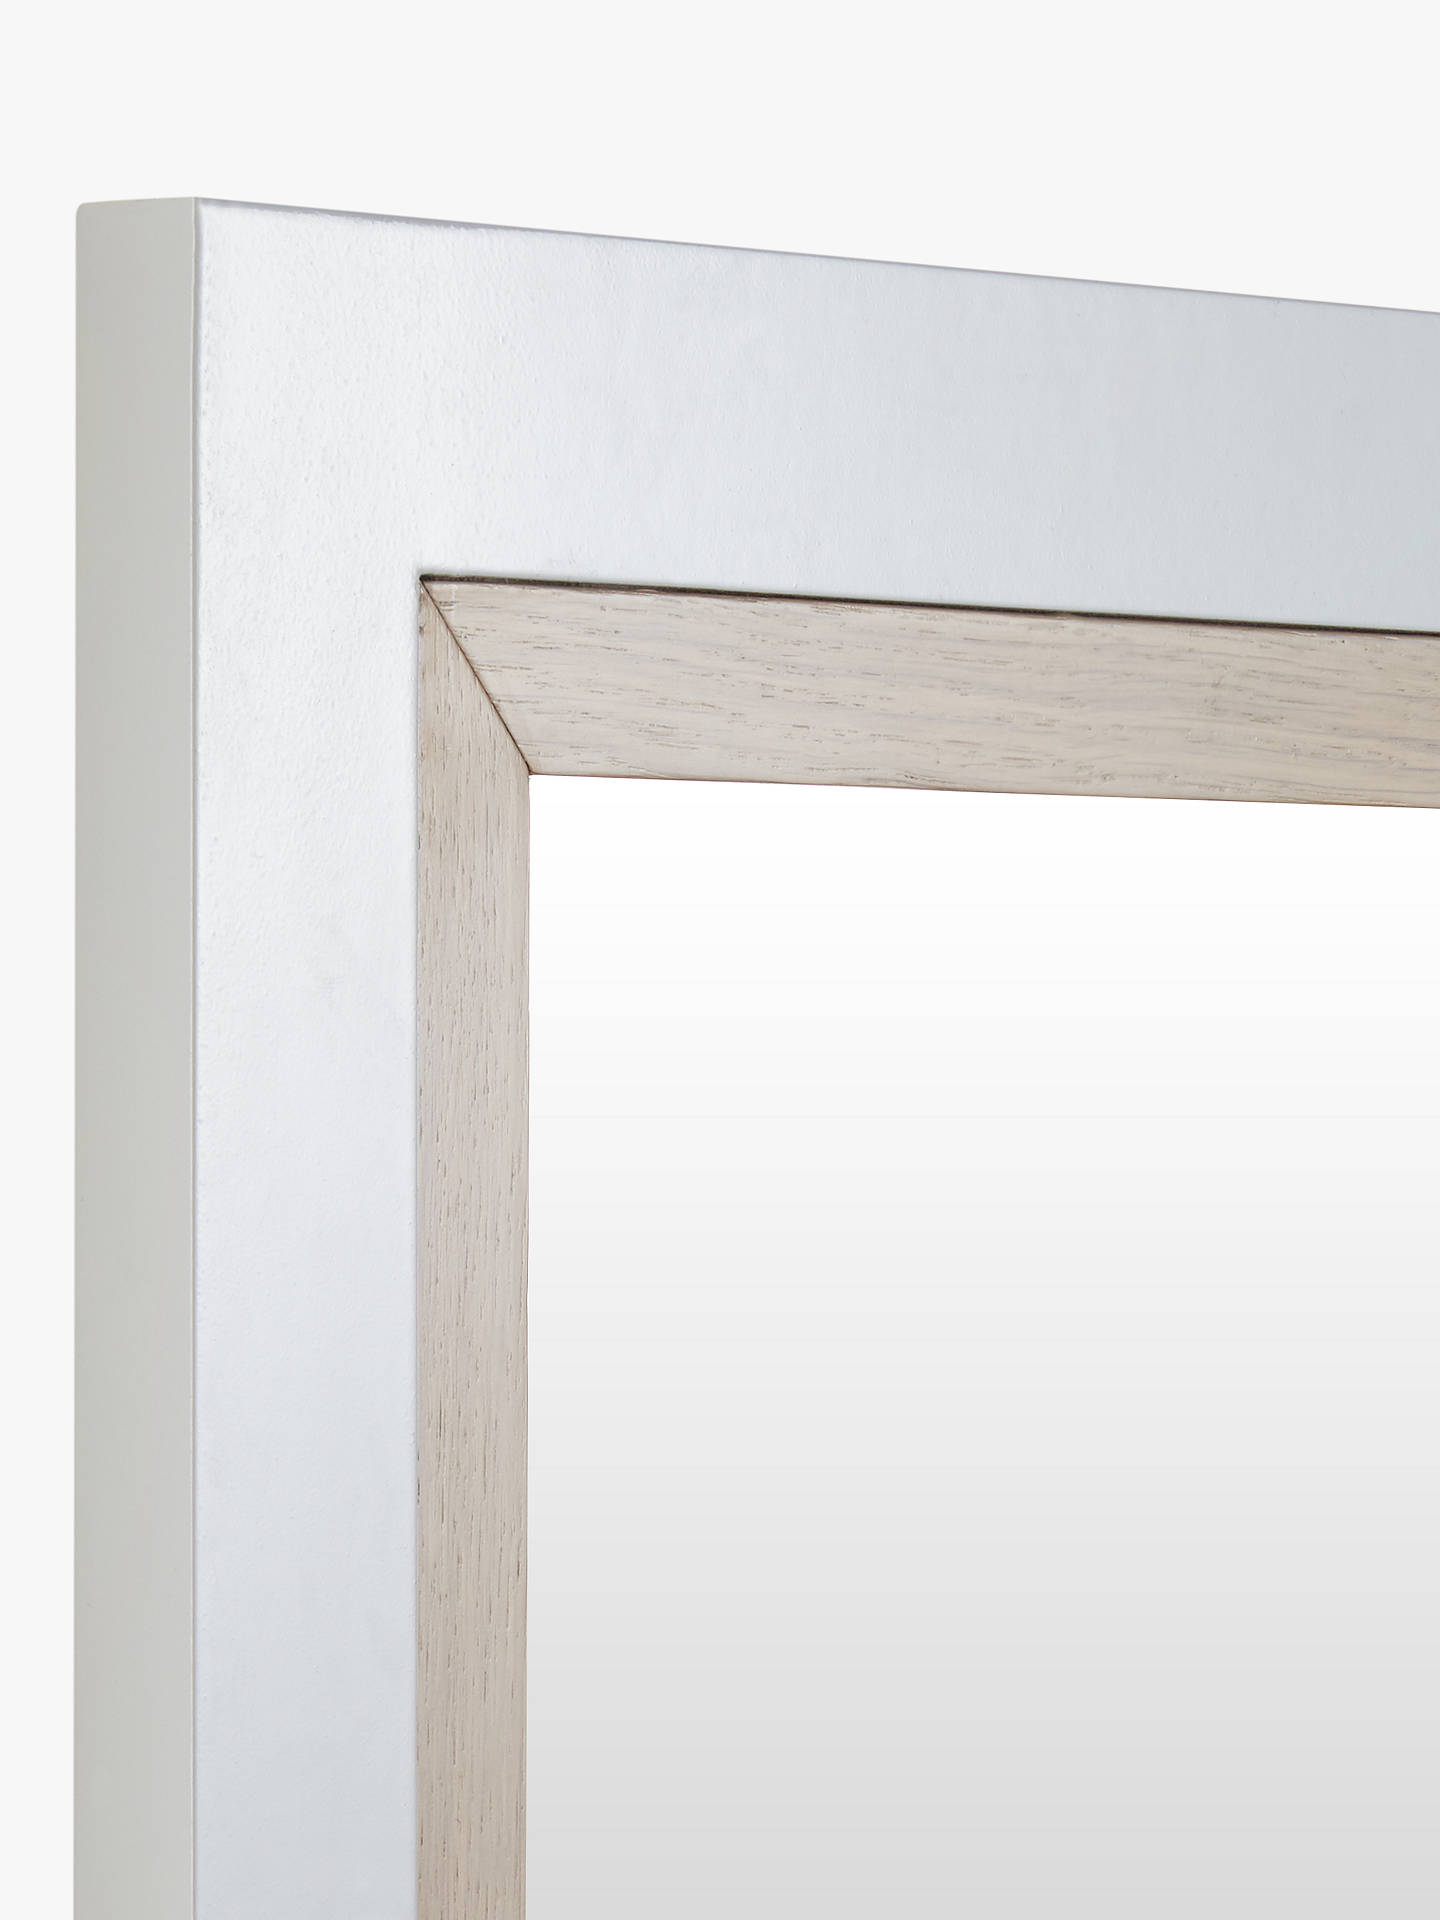 ... BuyCroft Collection Blakeney Bathroom Mirror, Light Silver Online at johnlewis.com ...